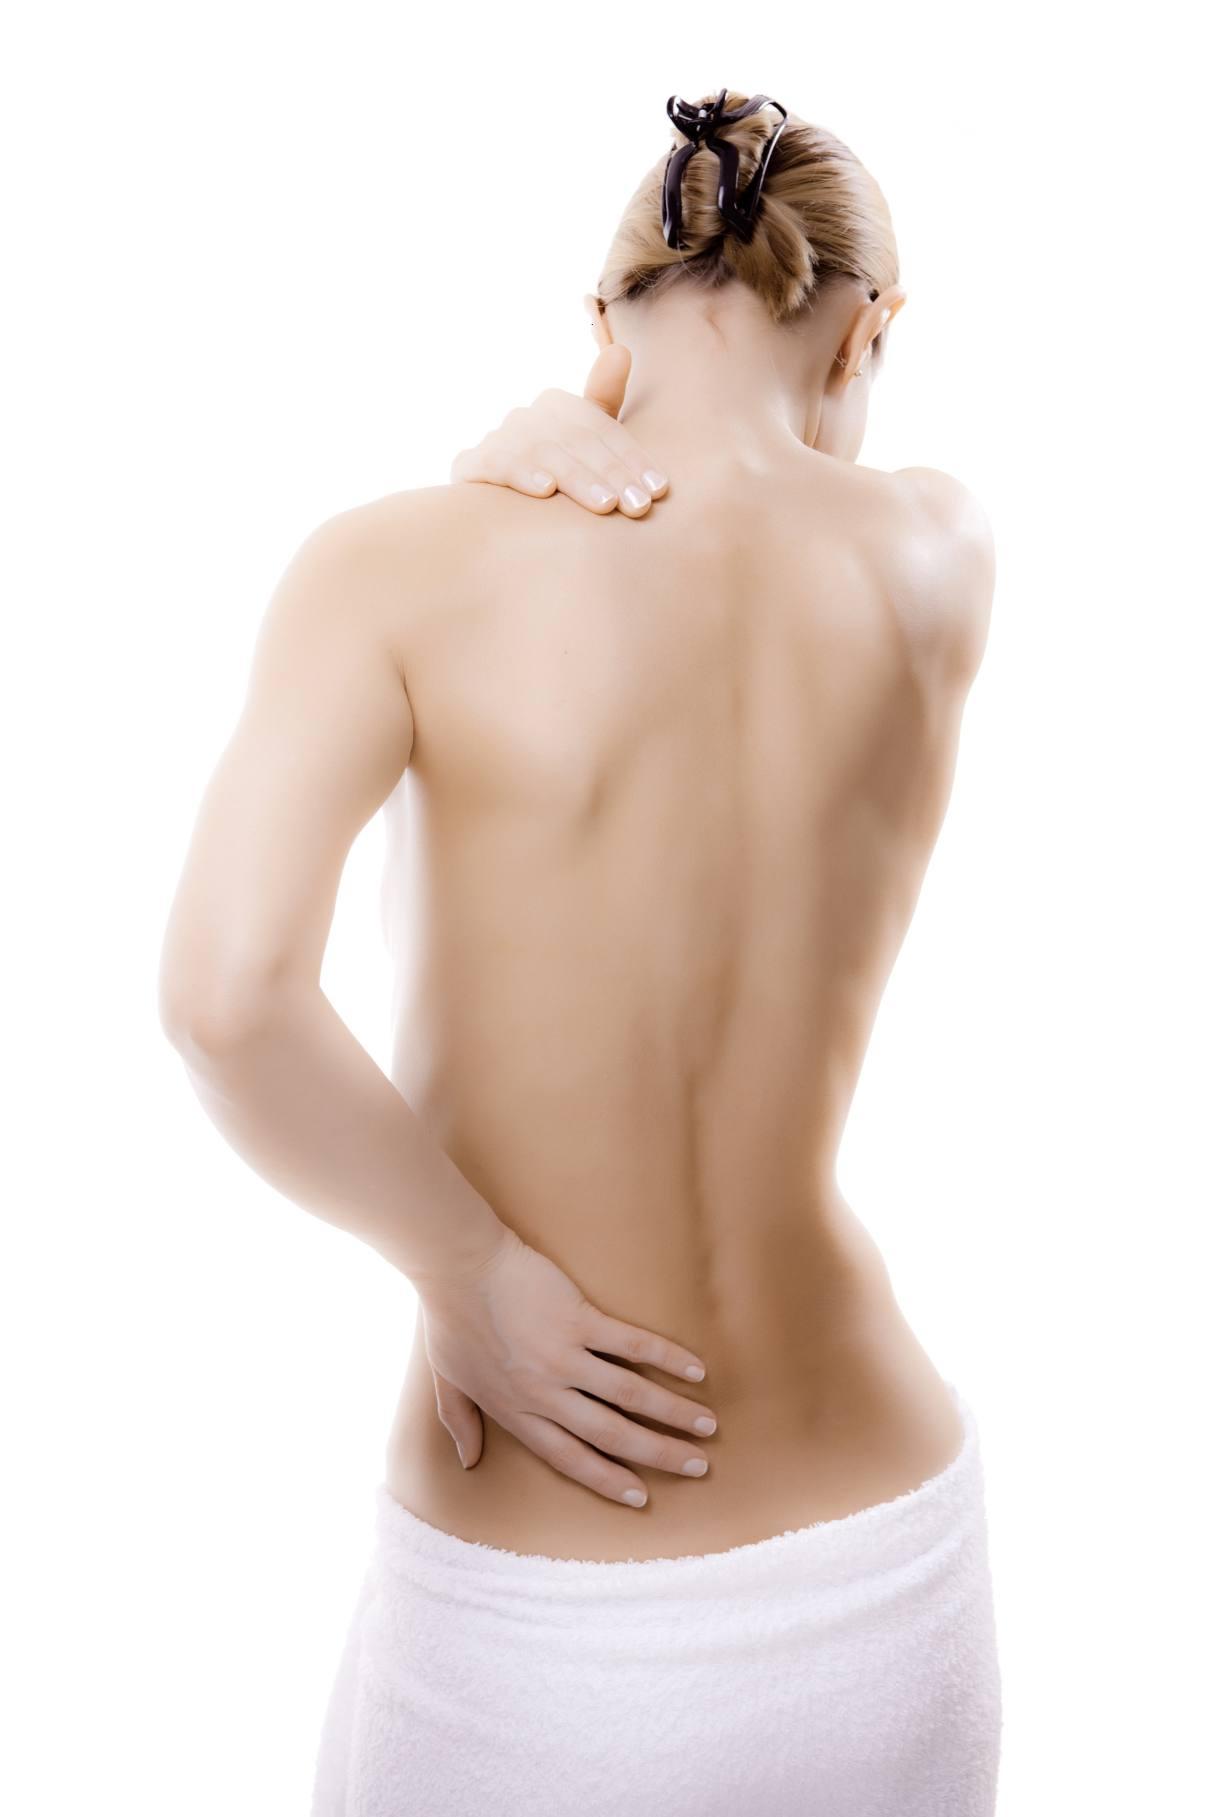 dolor-de-espalda-reflexologia-podal